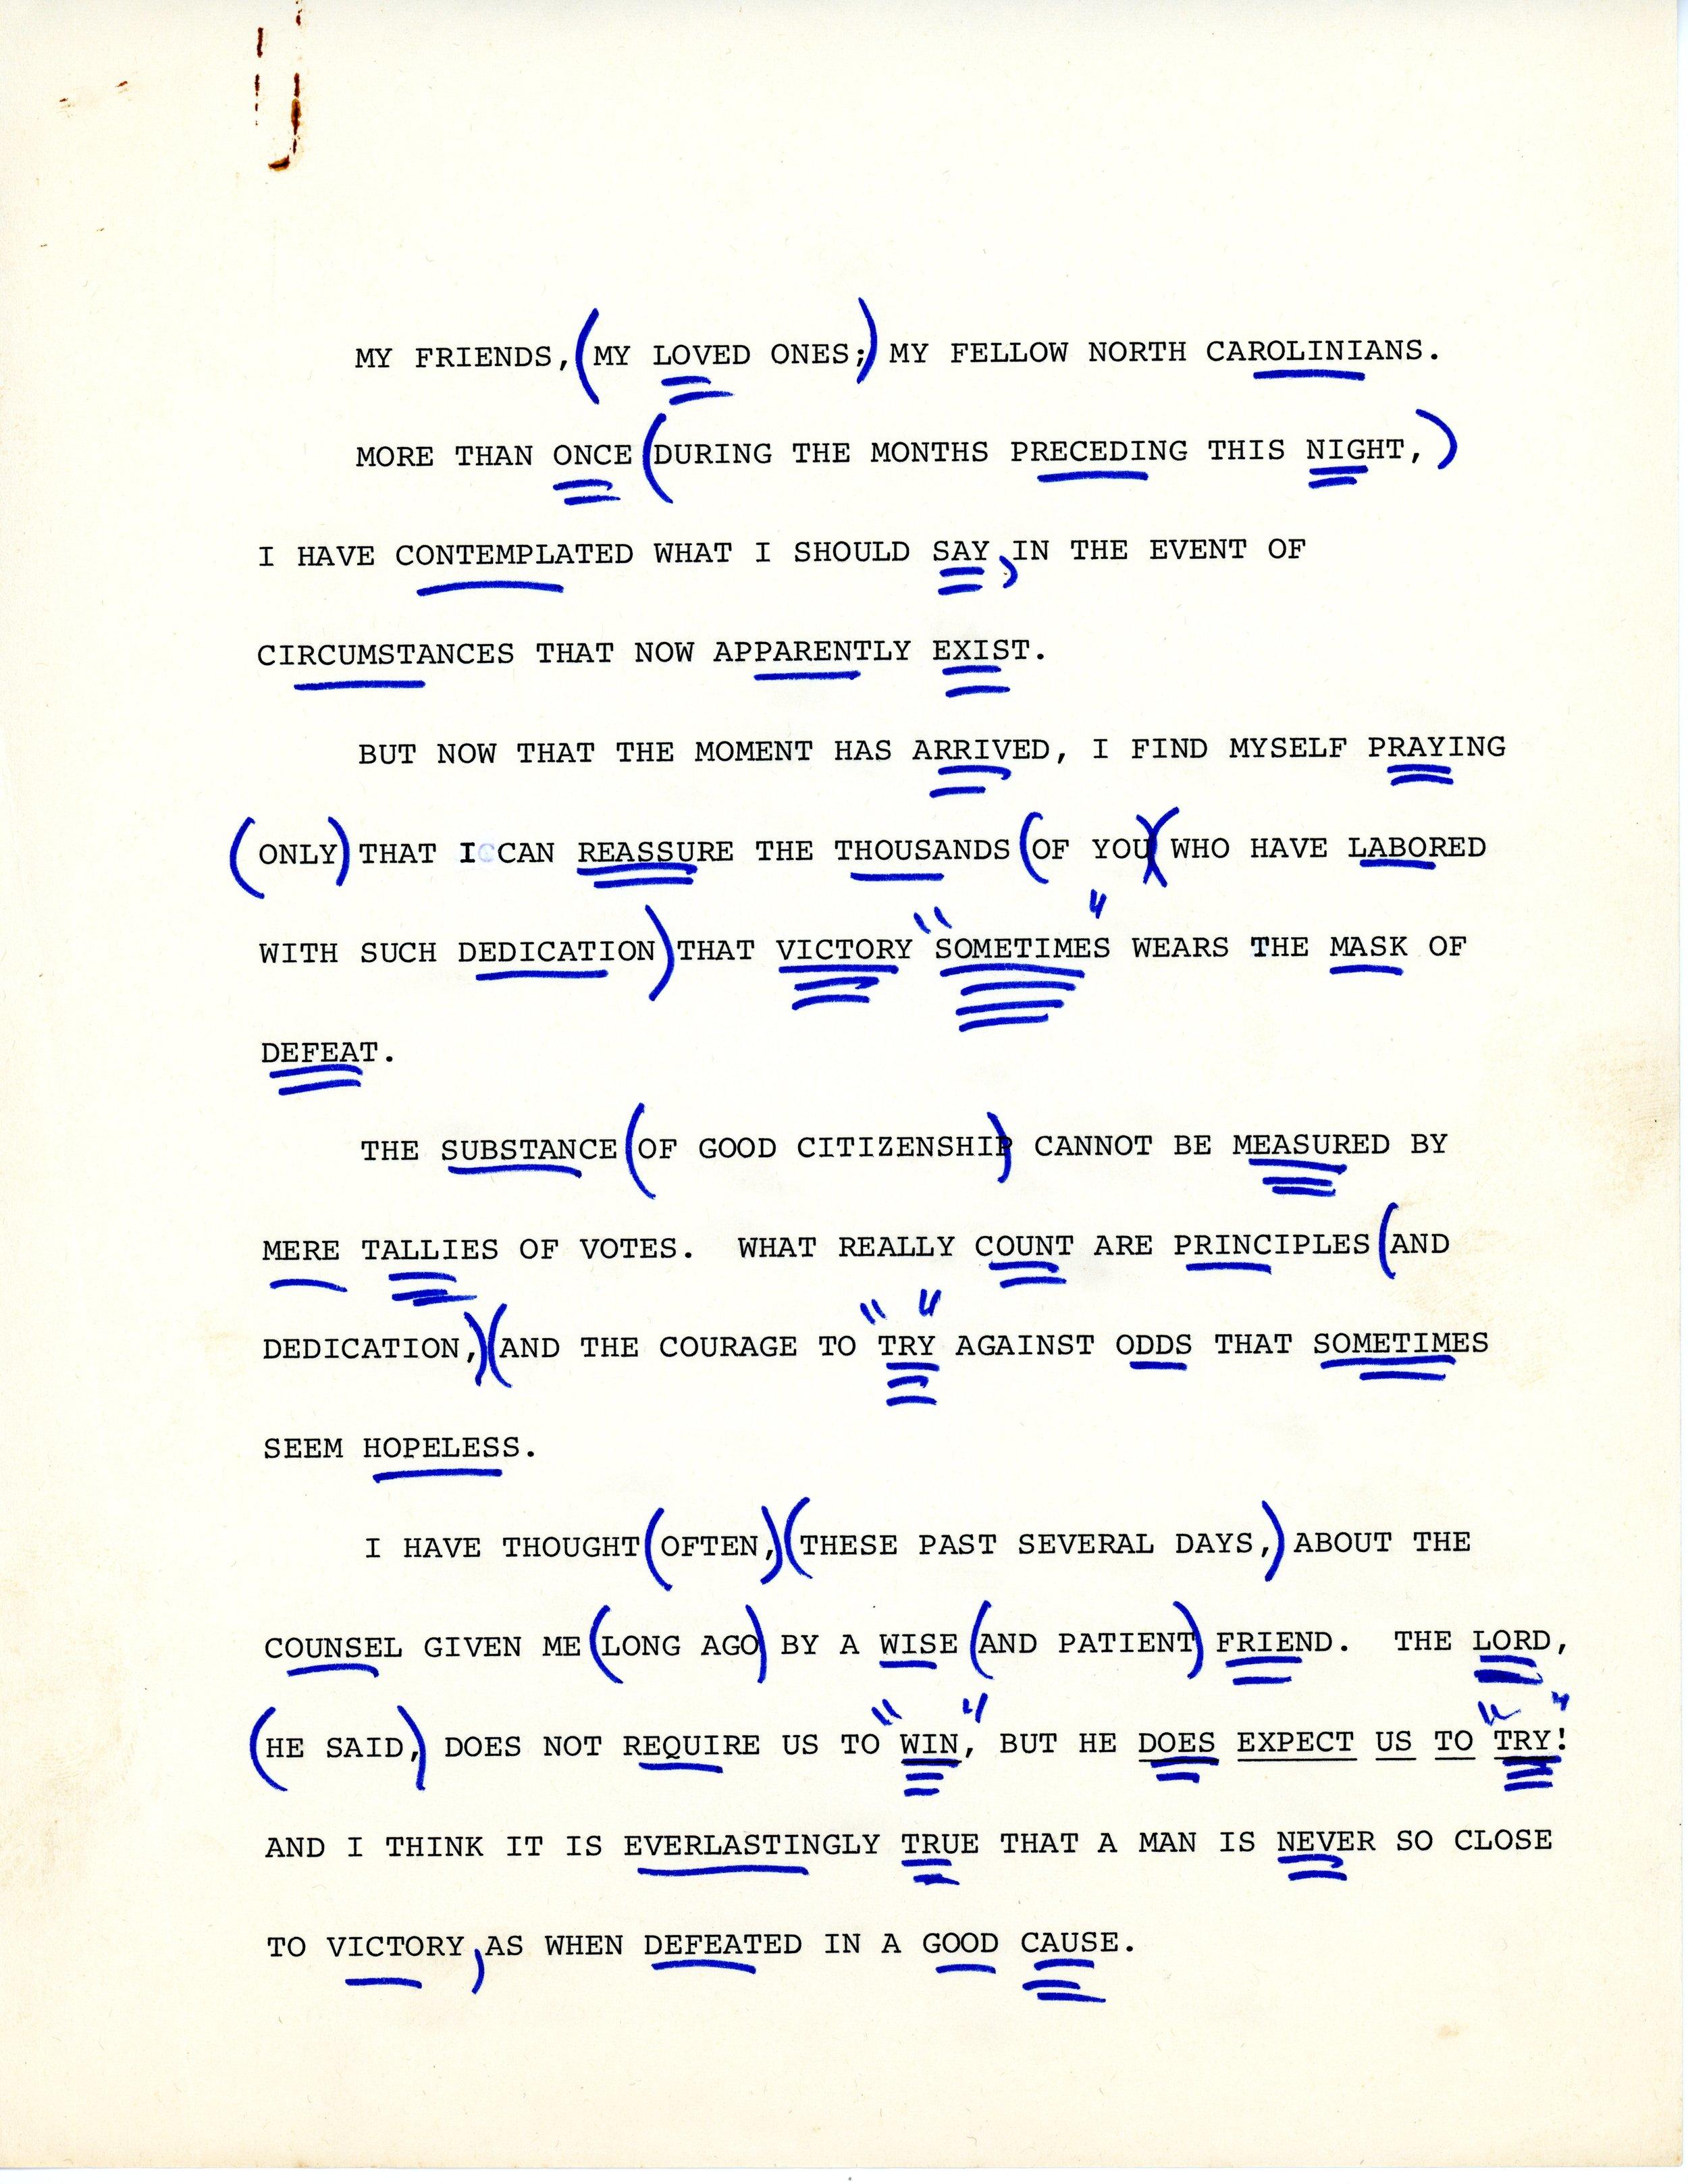 Helms 1972 Concession Speech001.jpg